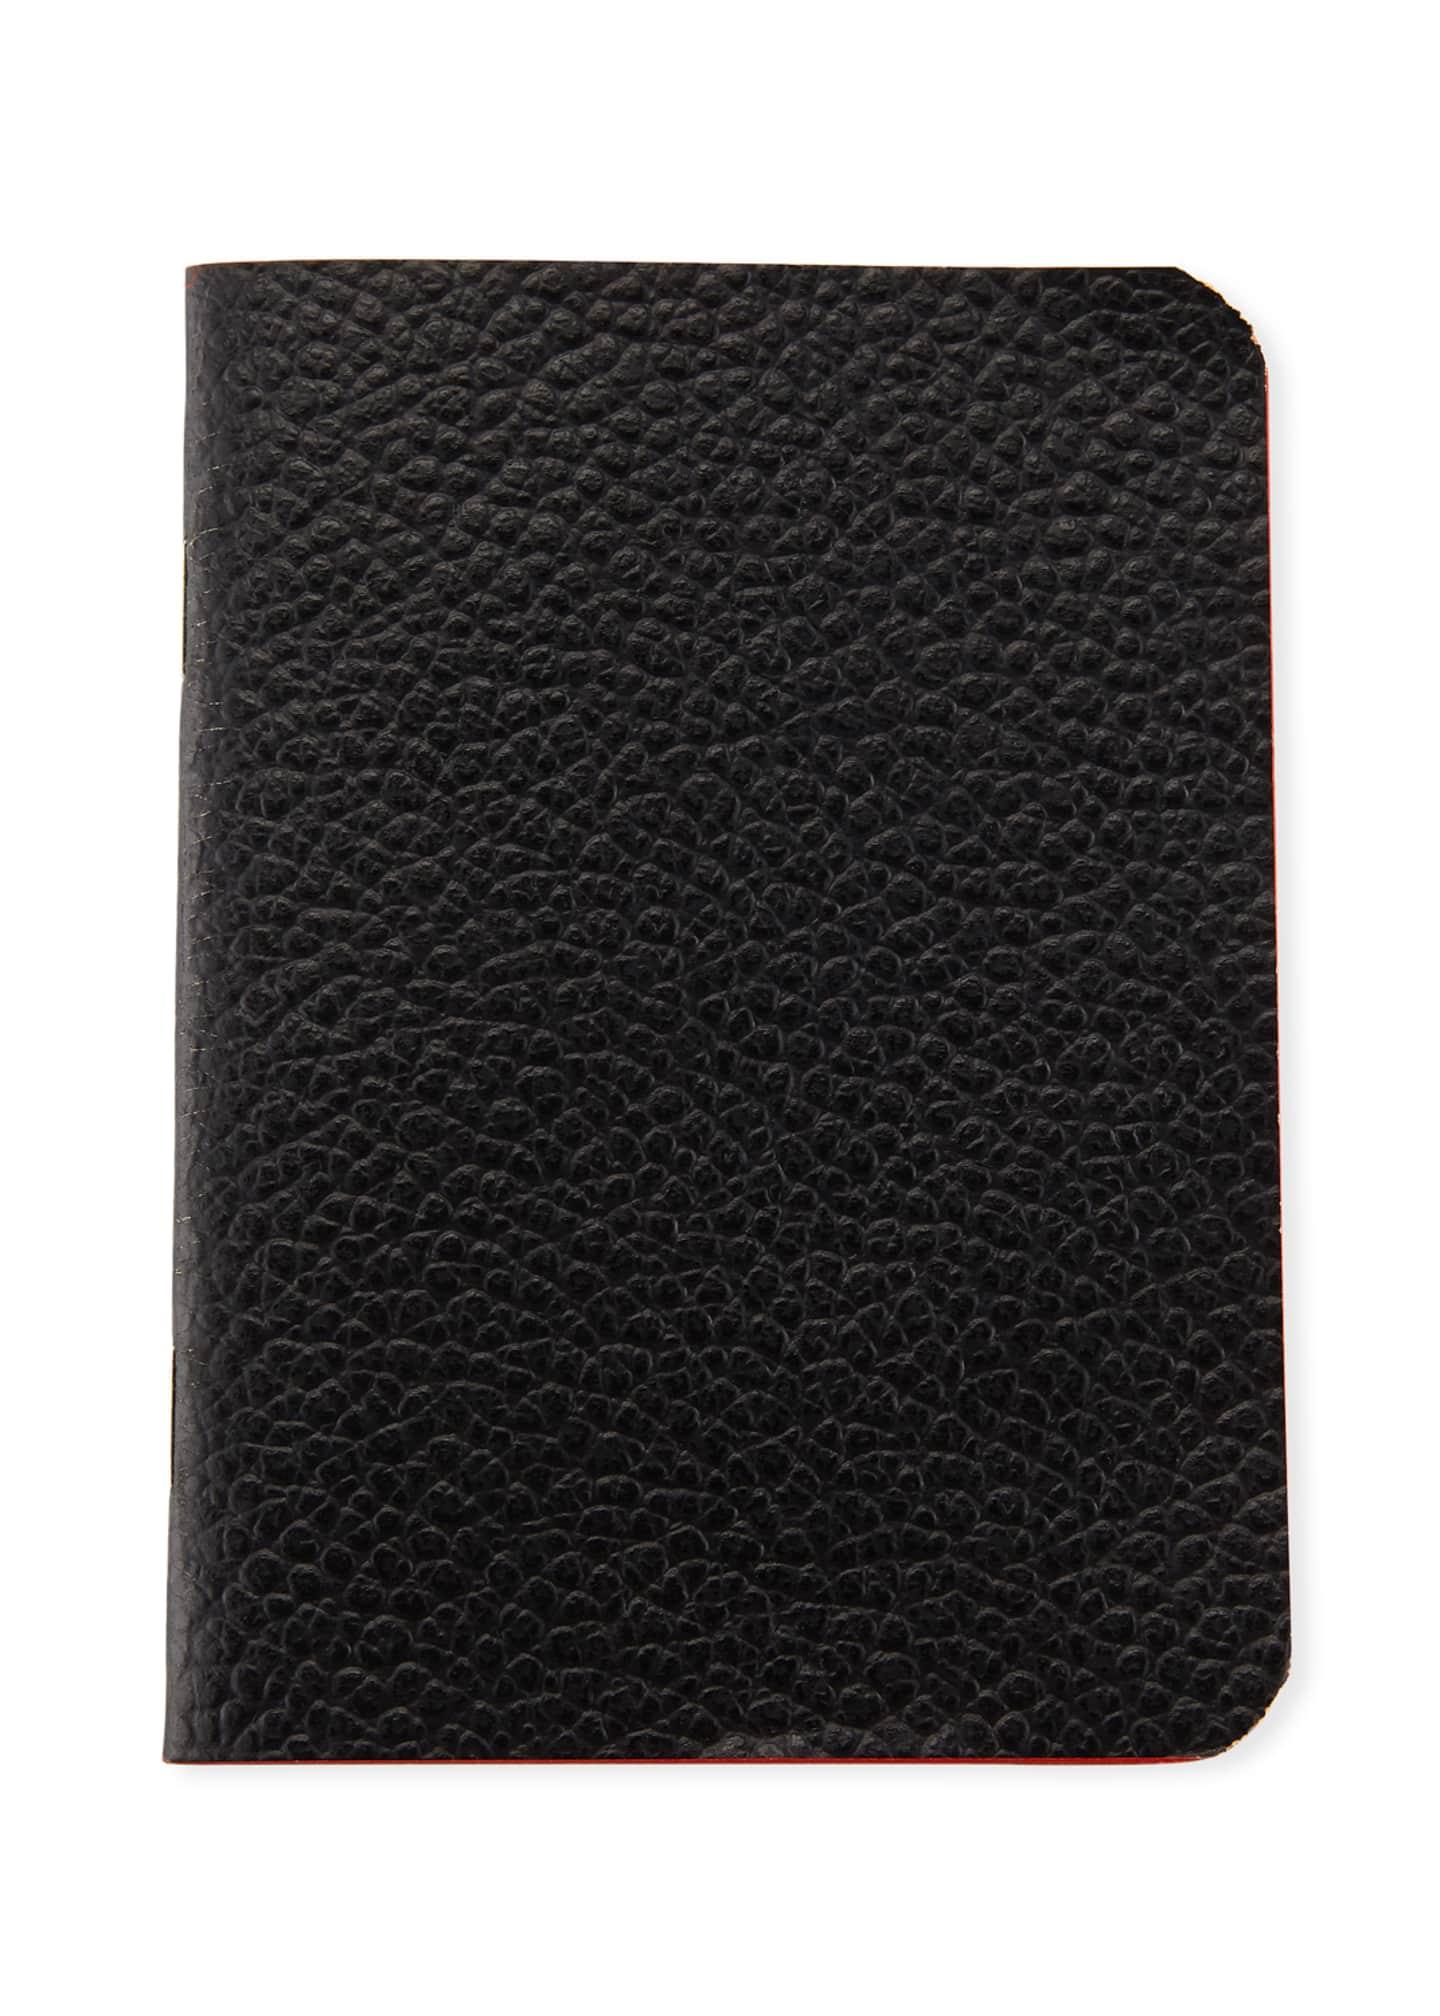 Choosing Keeping Handmade Leatherette Small Notebook